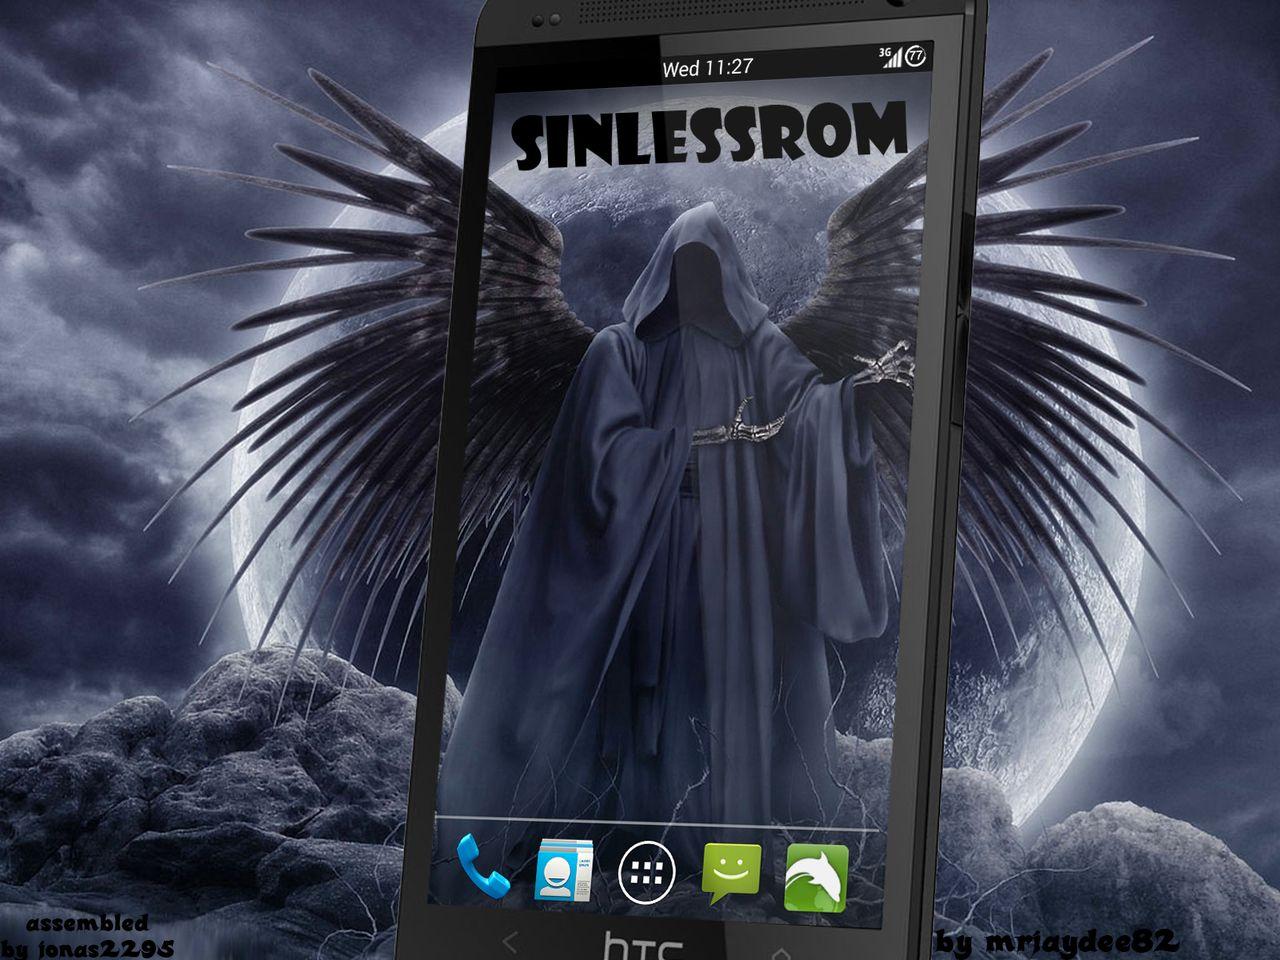 [ROM HTC ONE M8] LOLLIPOP| SinLessROM GPe v5.0.0 | Google Play Edition  Lordminimal